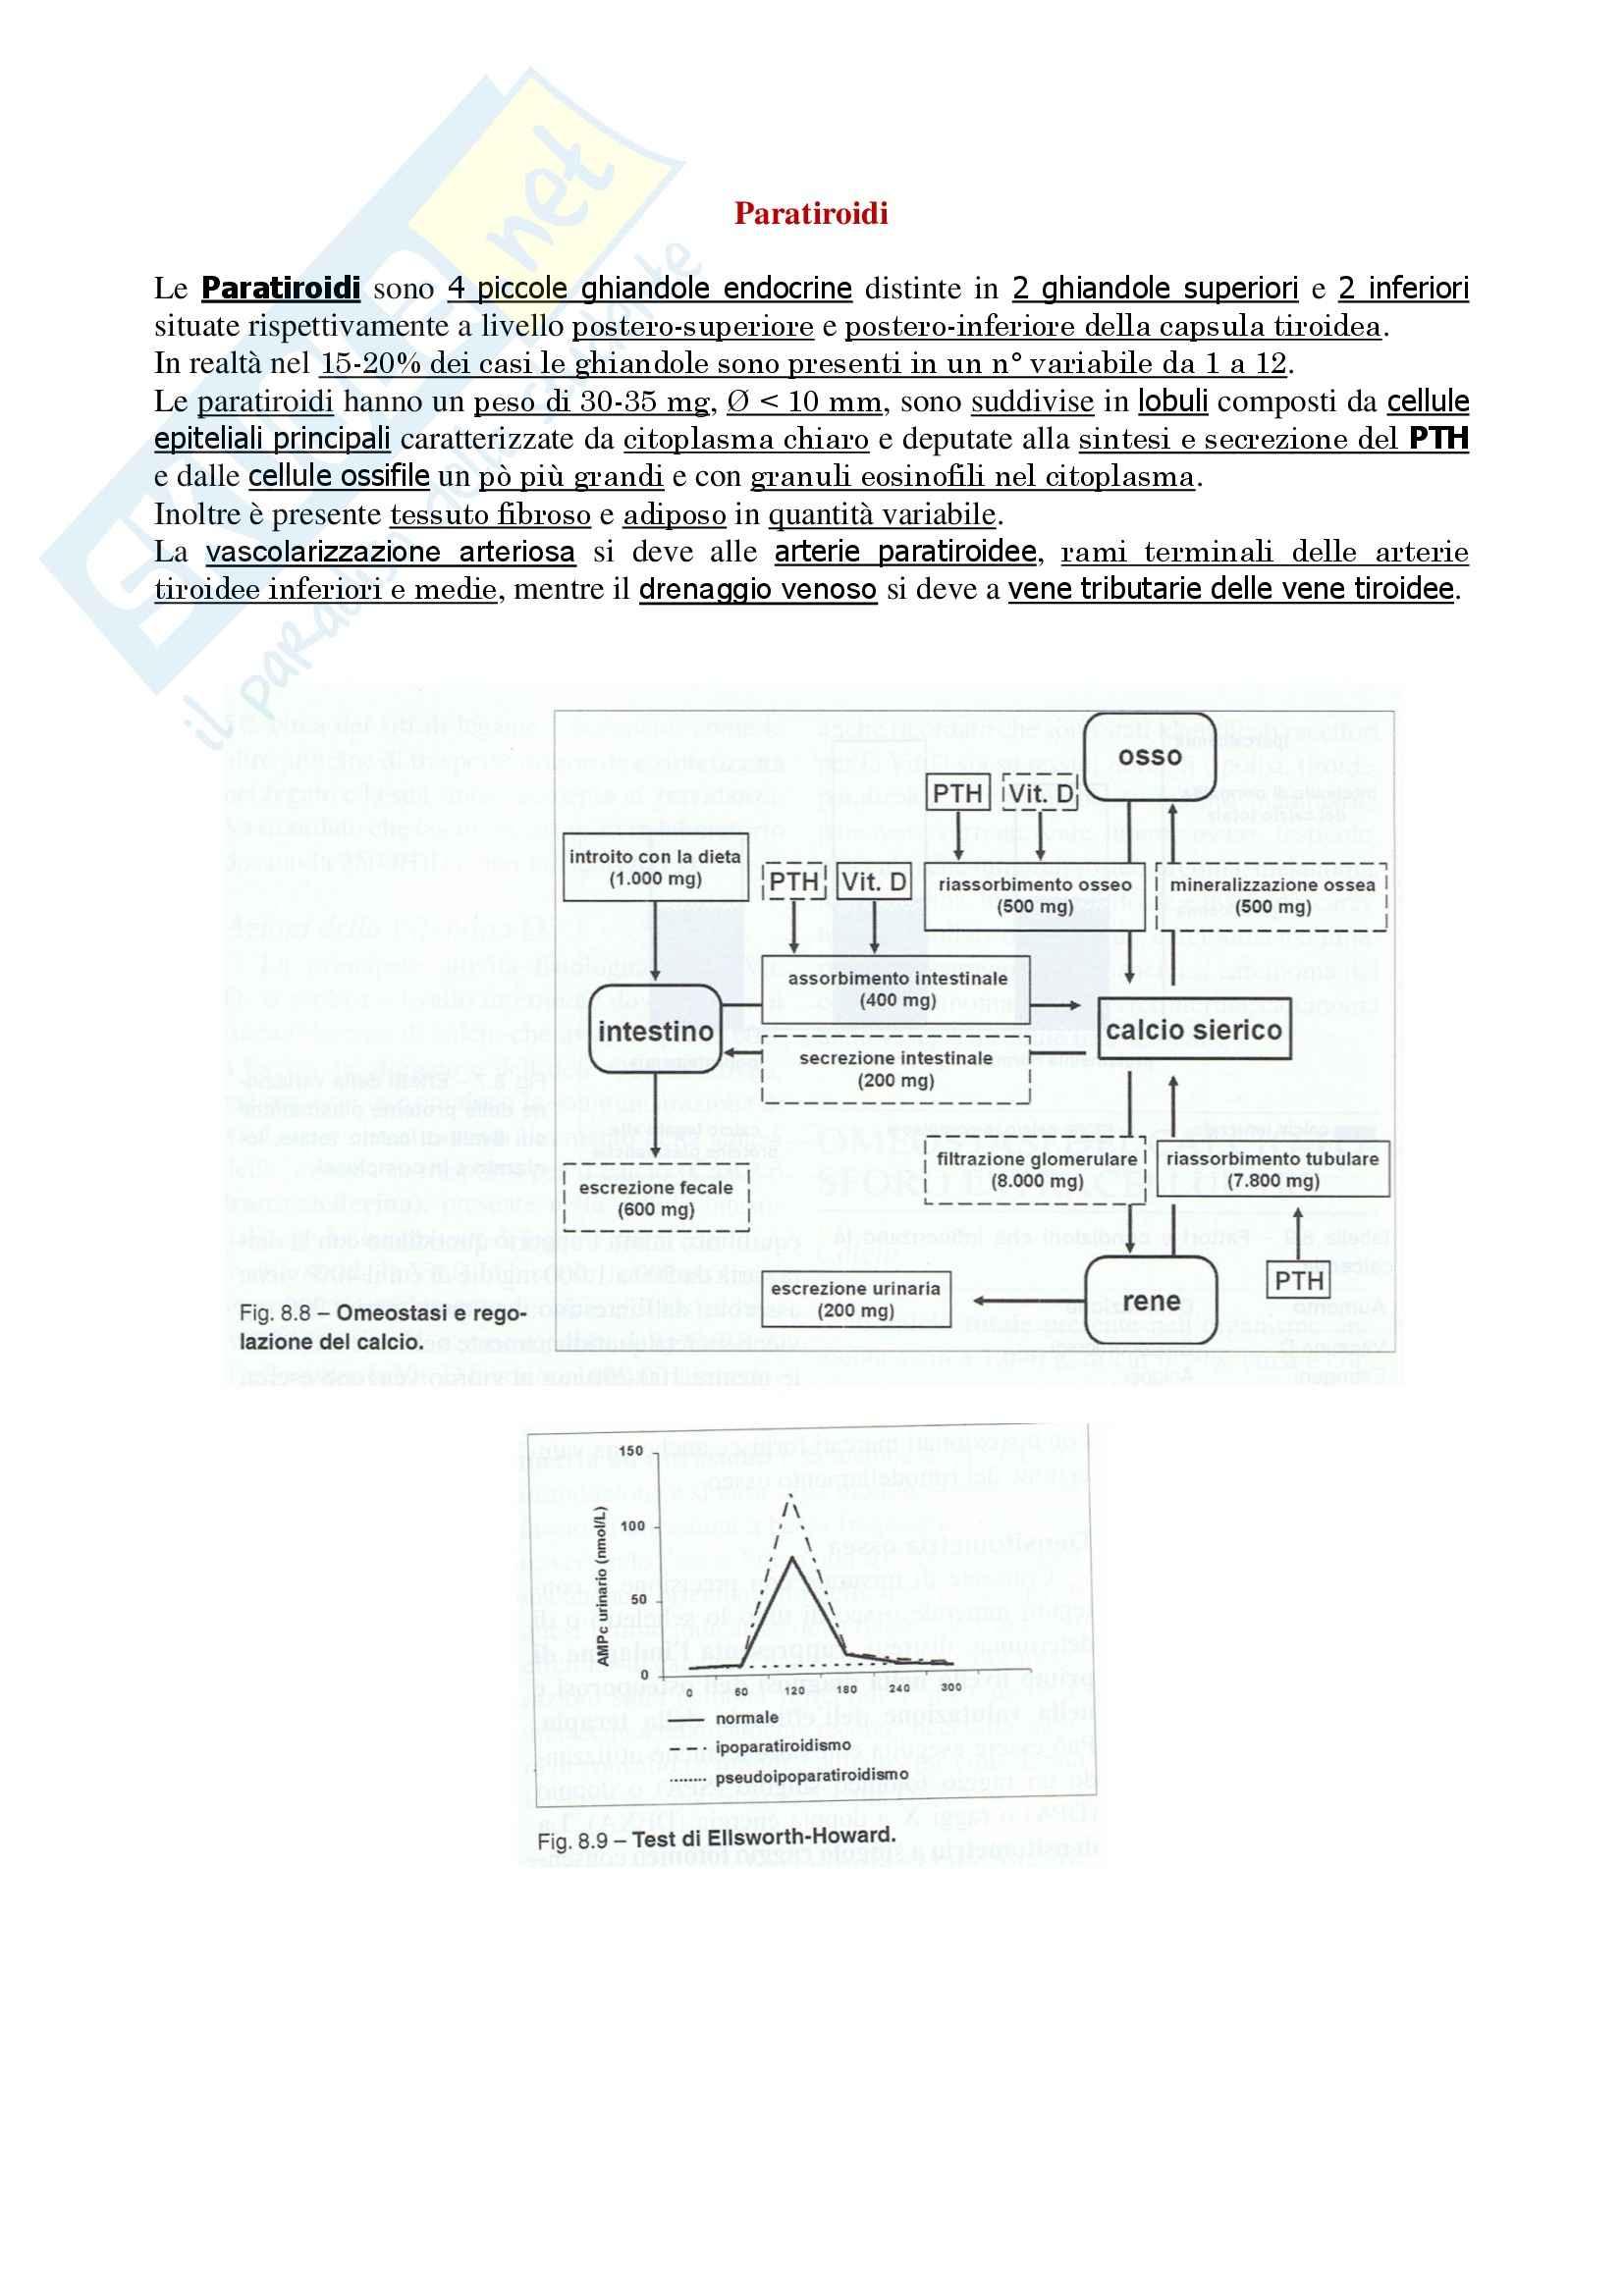 Endocrinologia - ghiandole paratiroidi